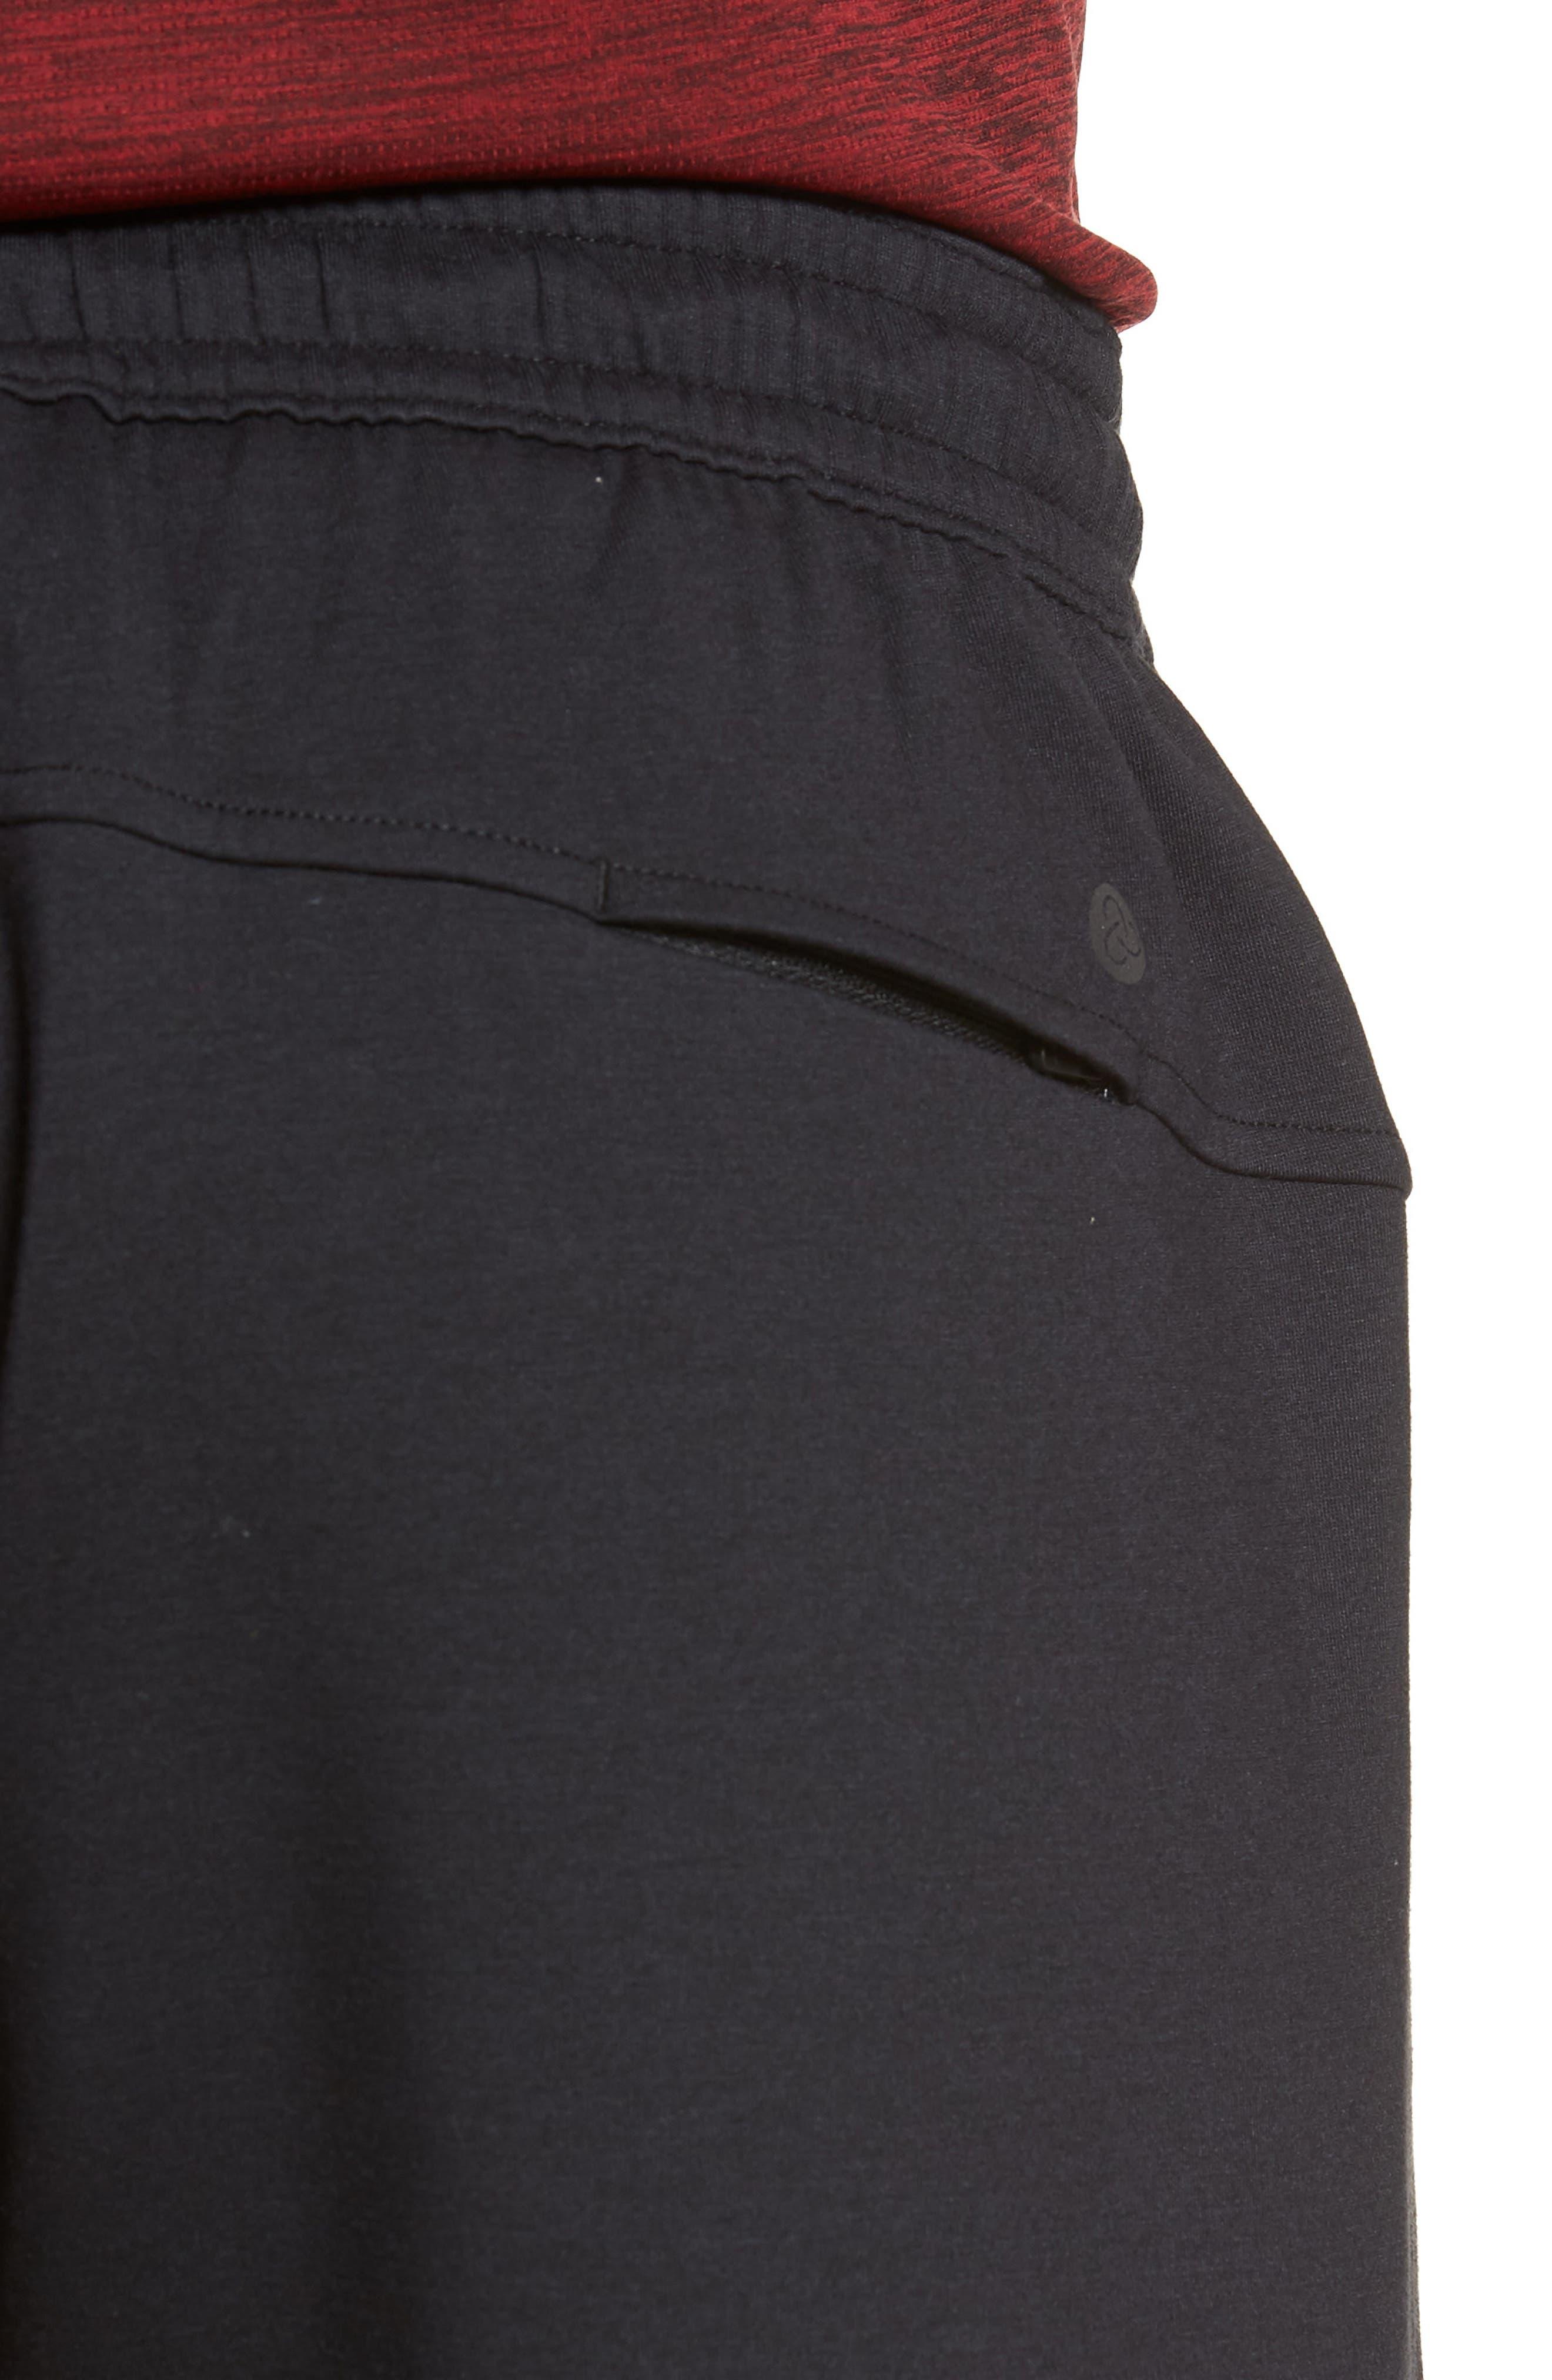 Update Tech Jogger Pants,                             Alternate thumbnail 4, color,                             BLACK